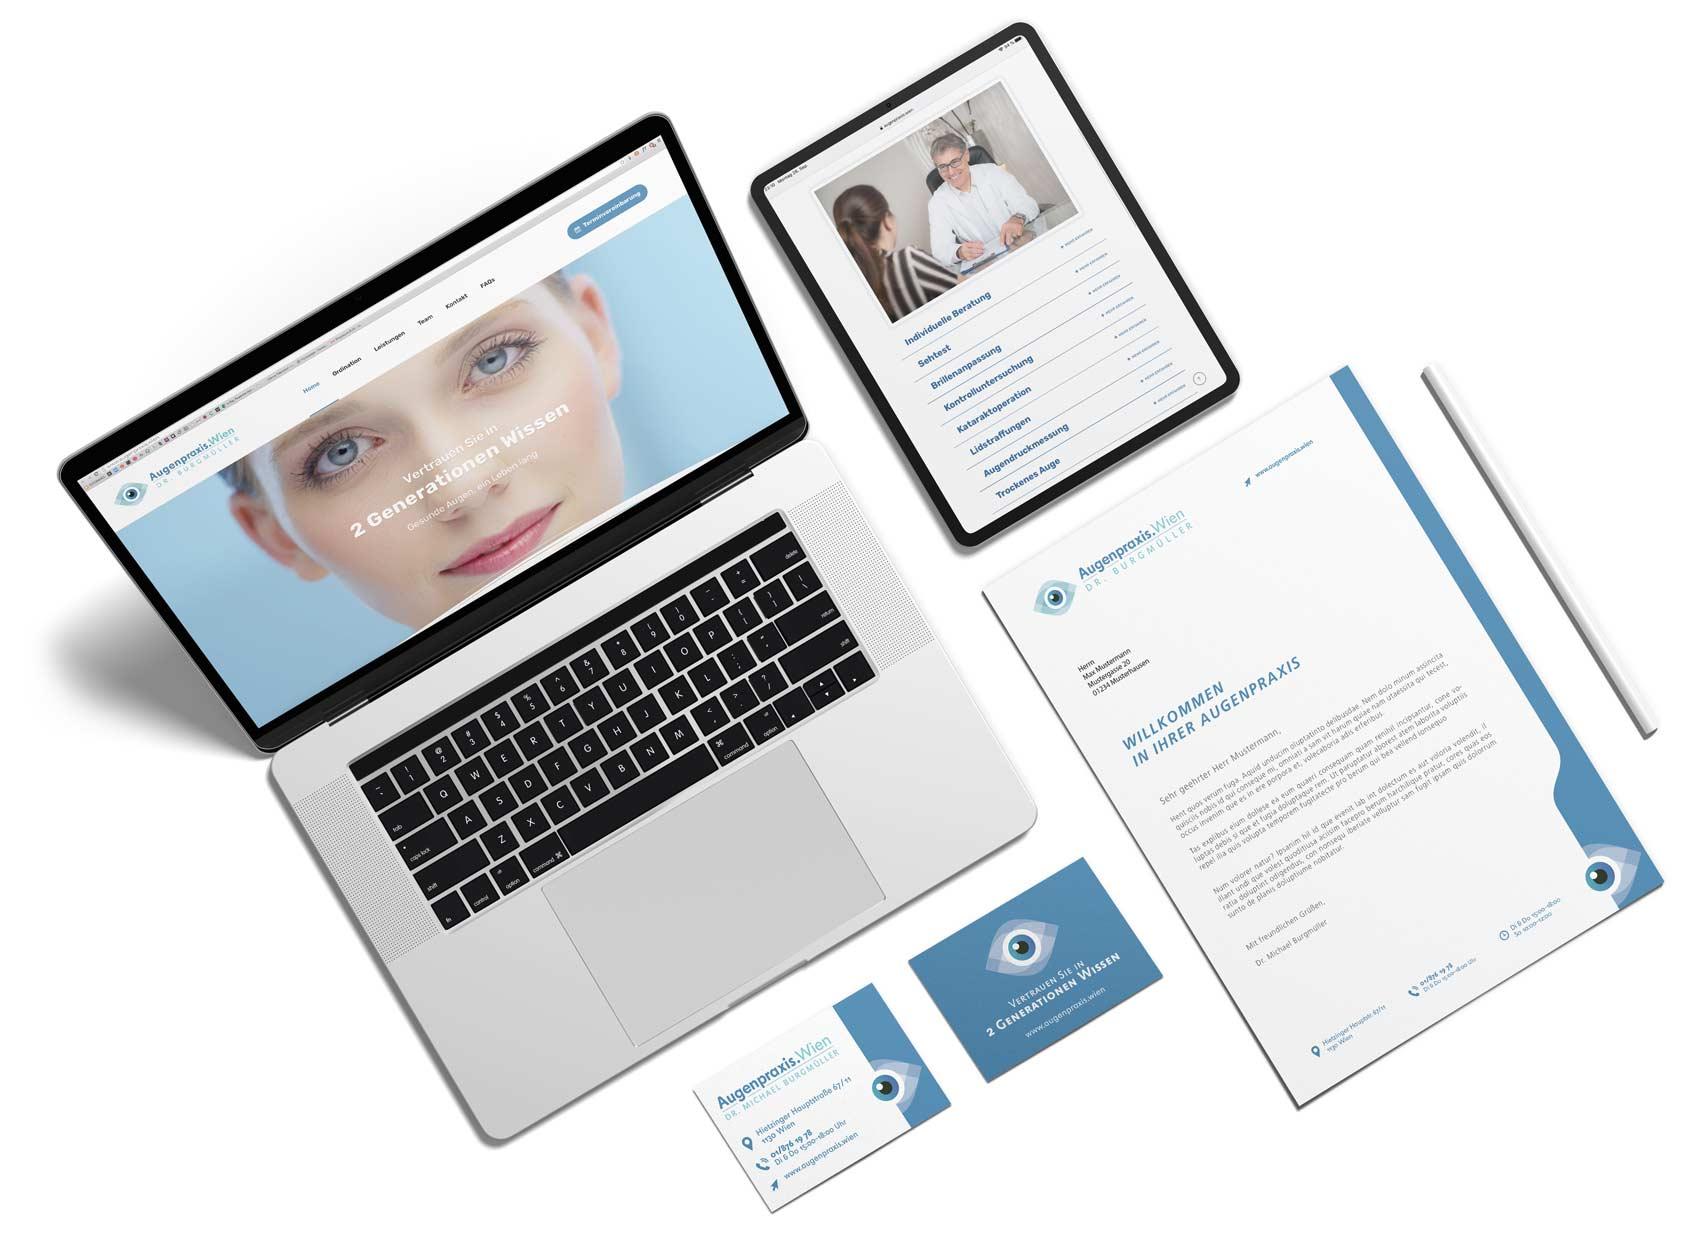 Webagentur Wien, Webdesigner Wien, Website erstellen lassen, professionelles Webdesign Mödling bei Wien, Webagentur, Homepage